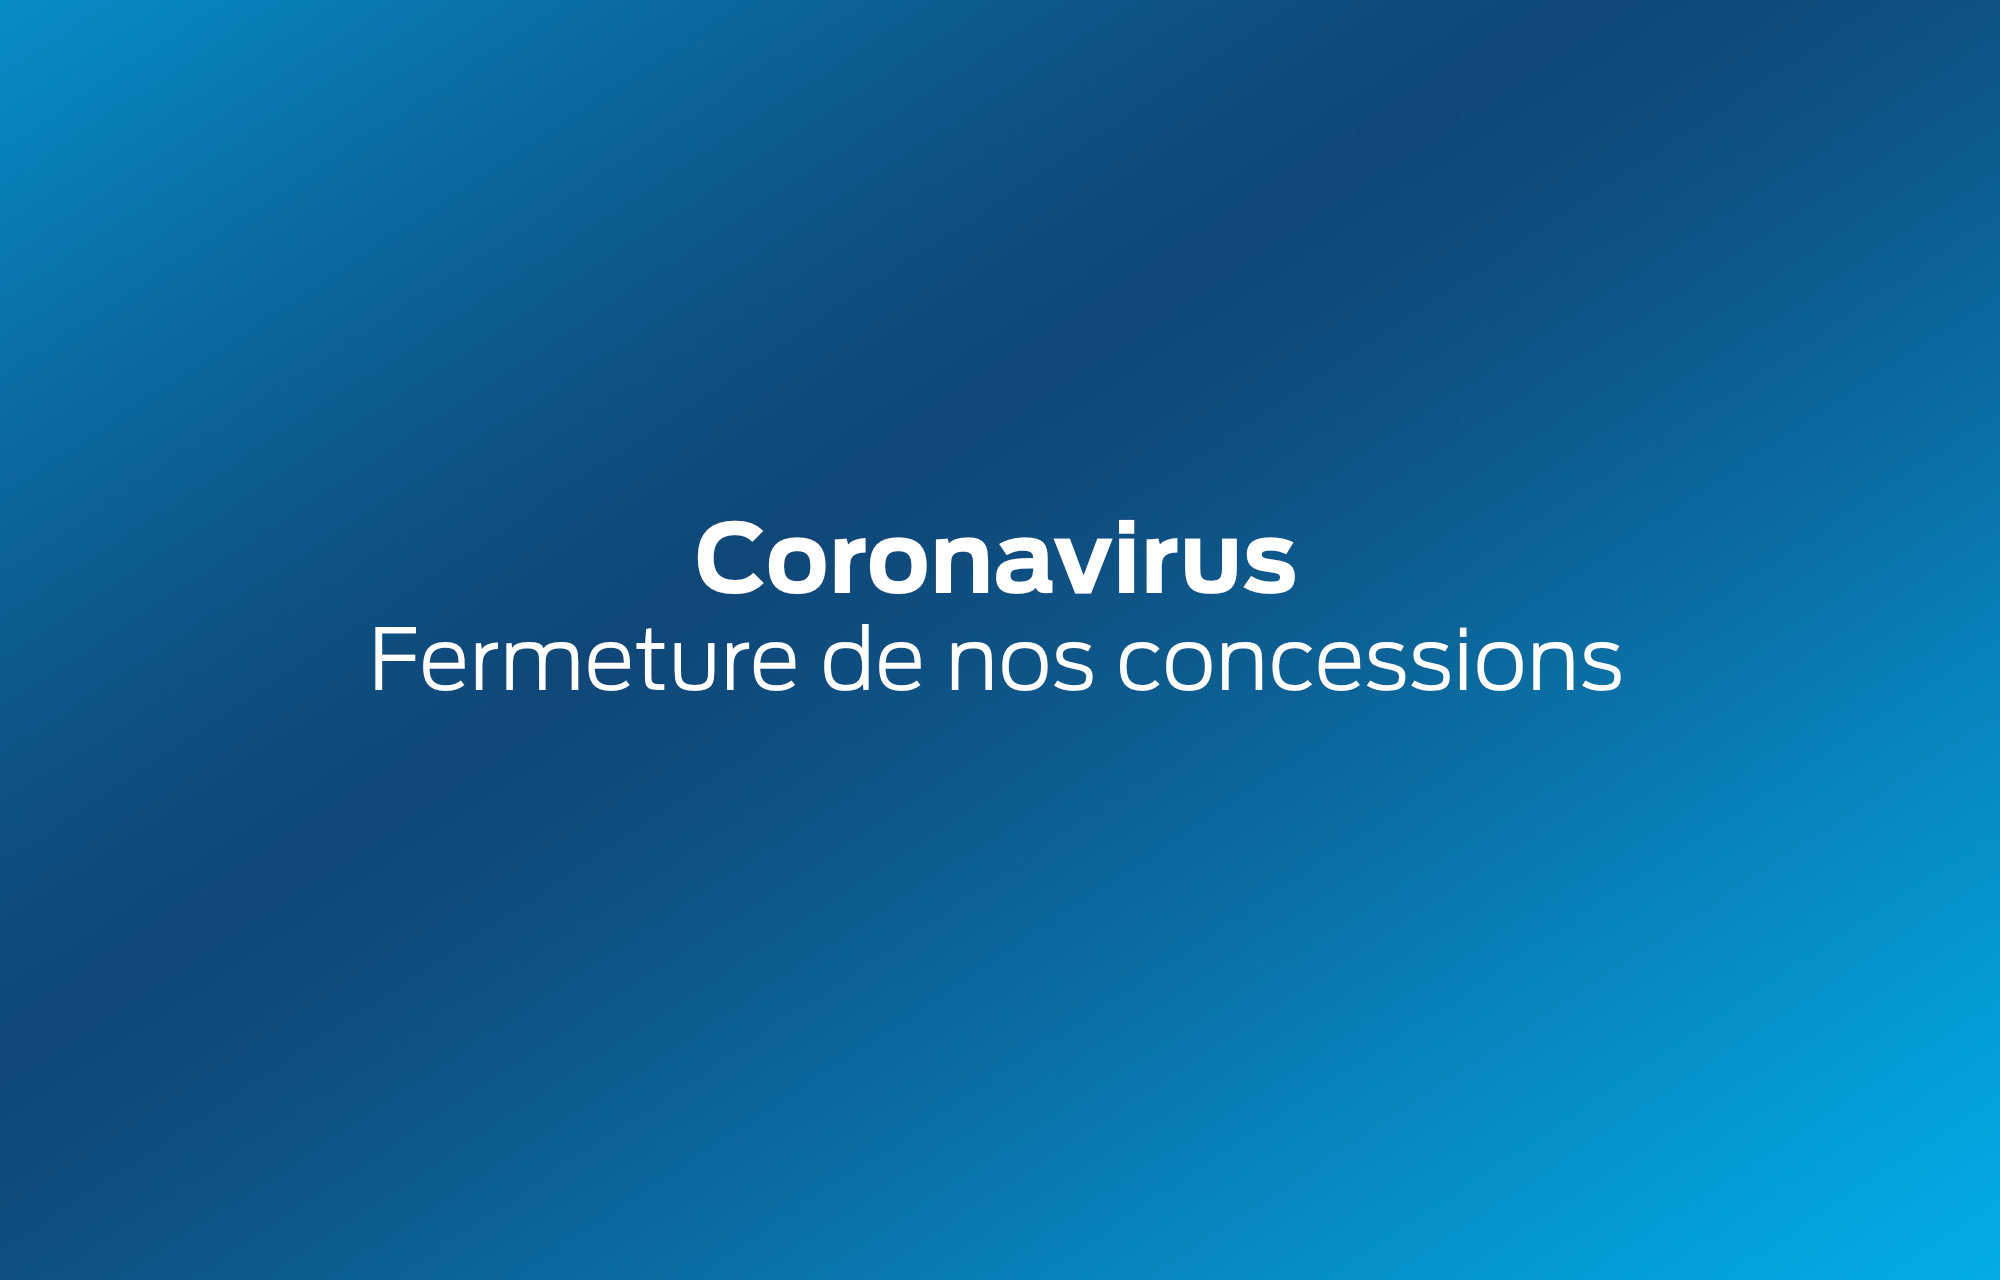 **Coronavirus** : Fermeture de nos concessions